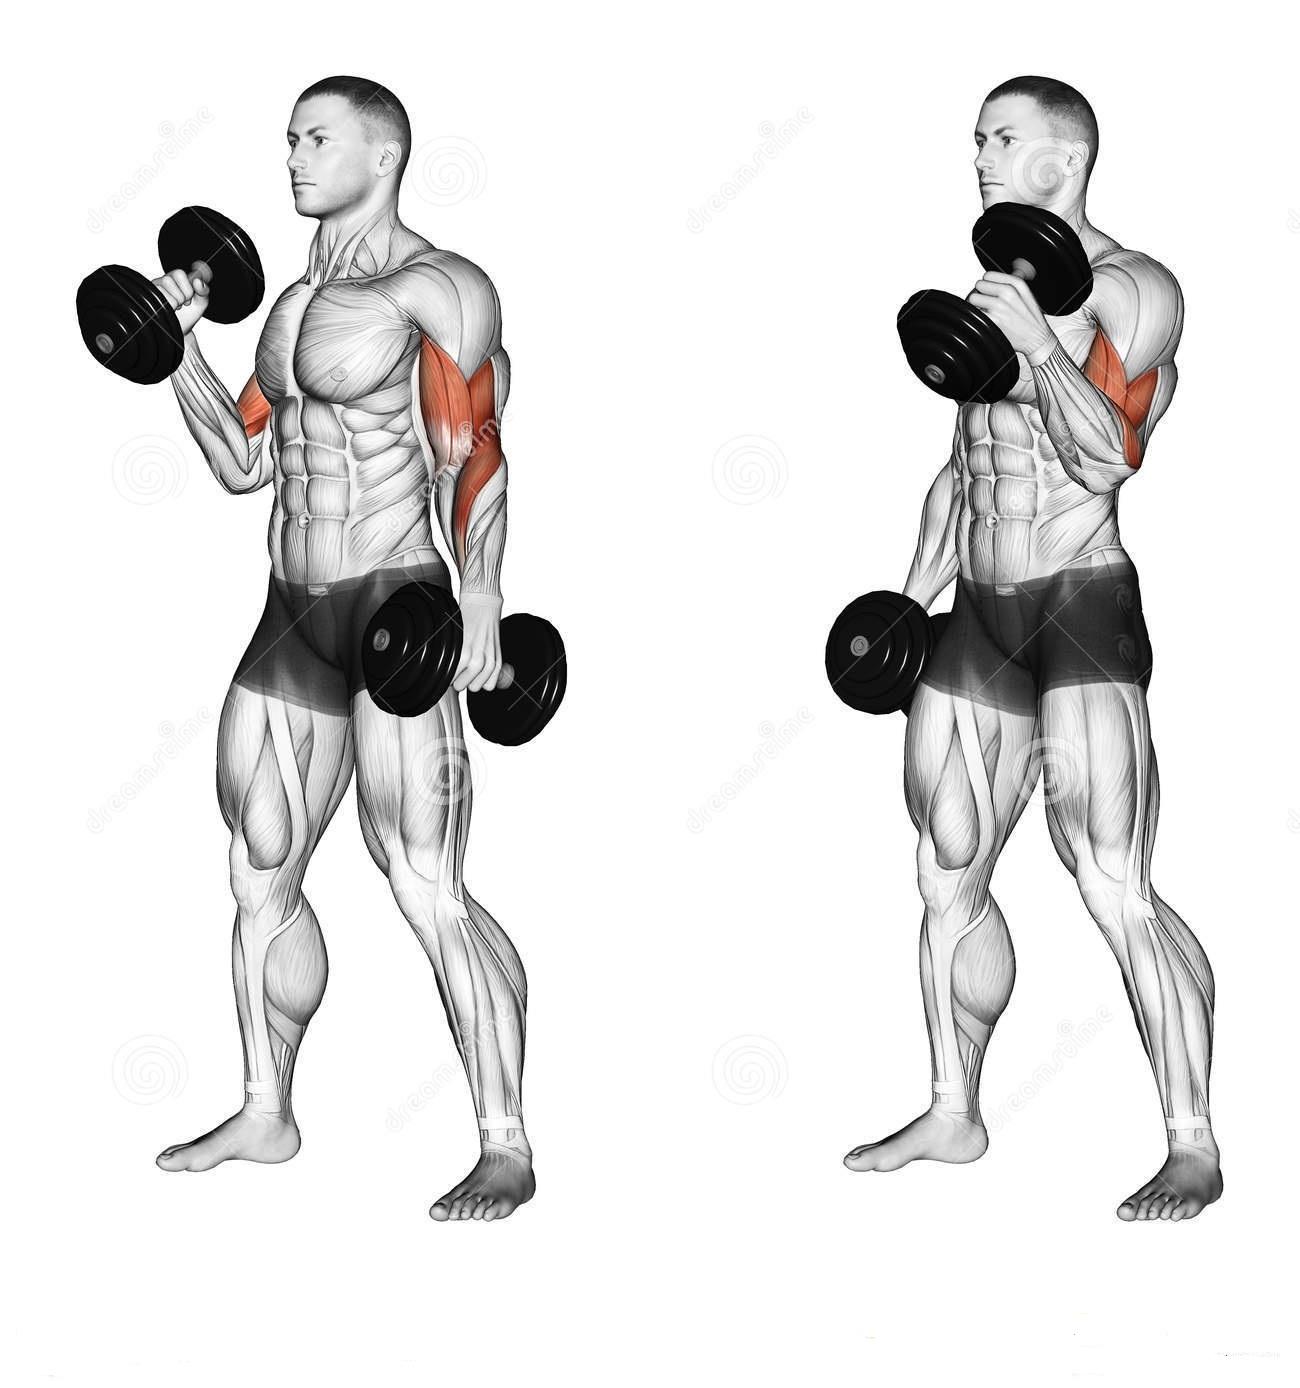 PROJECT NEXT - Fitness & Bodybuilding Freak